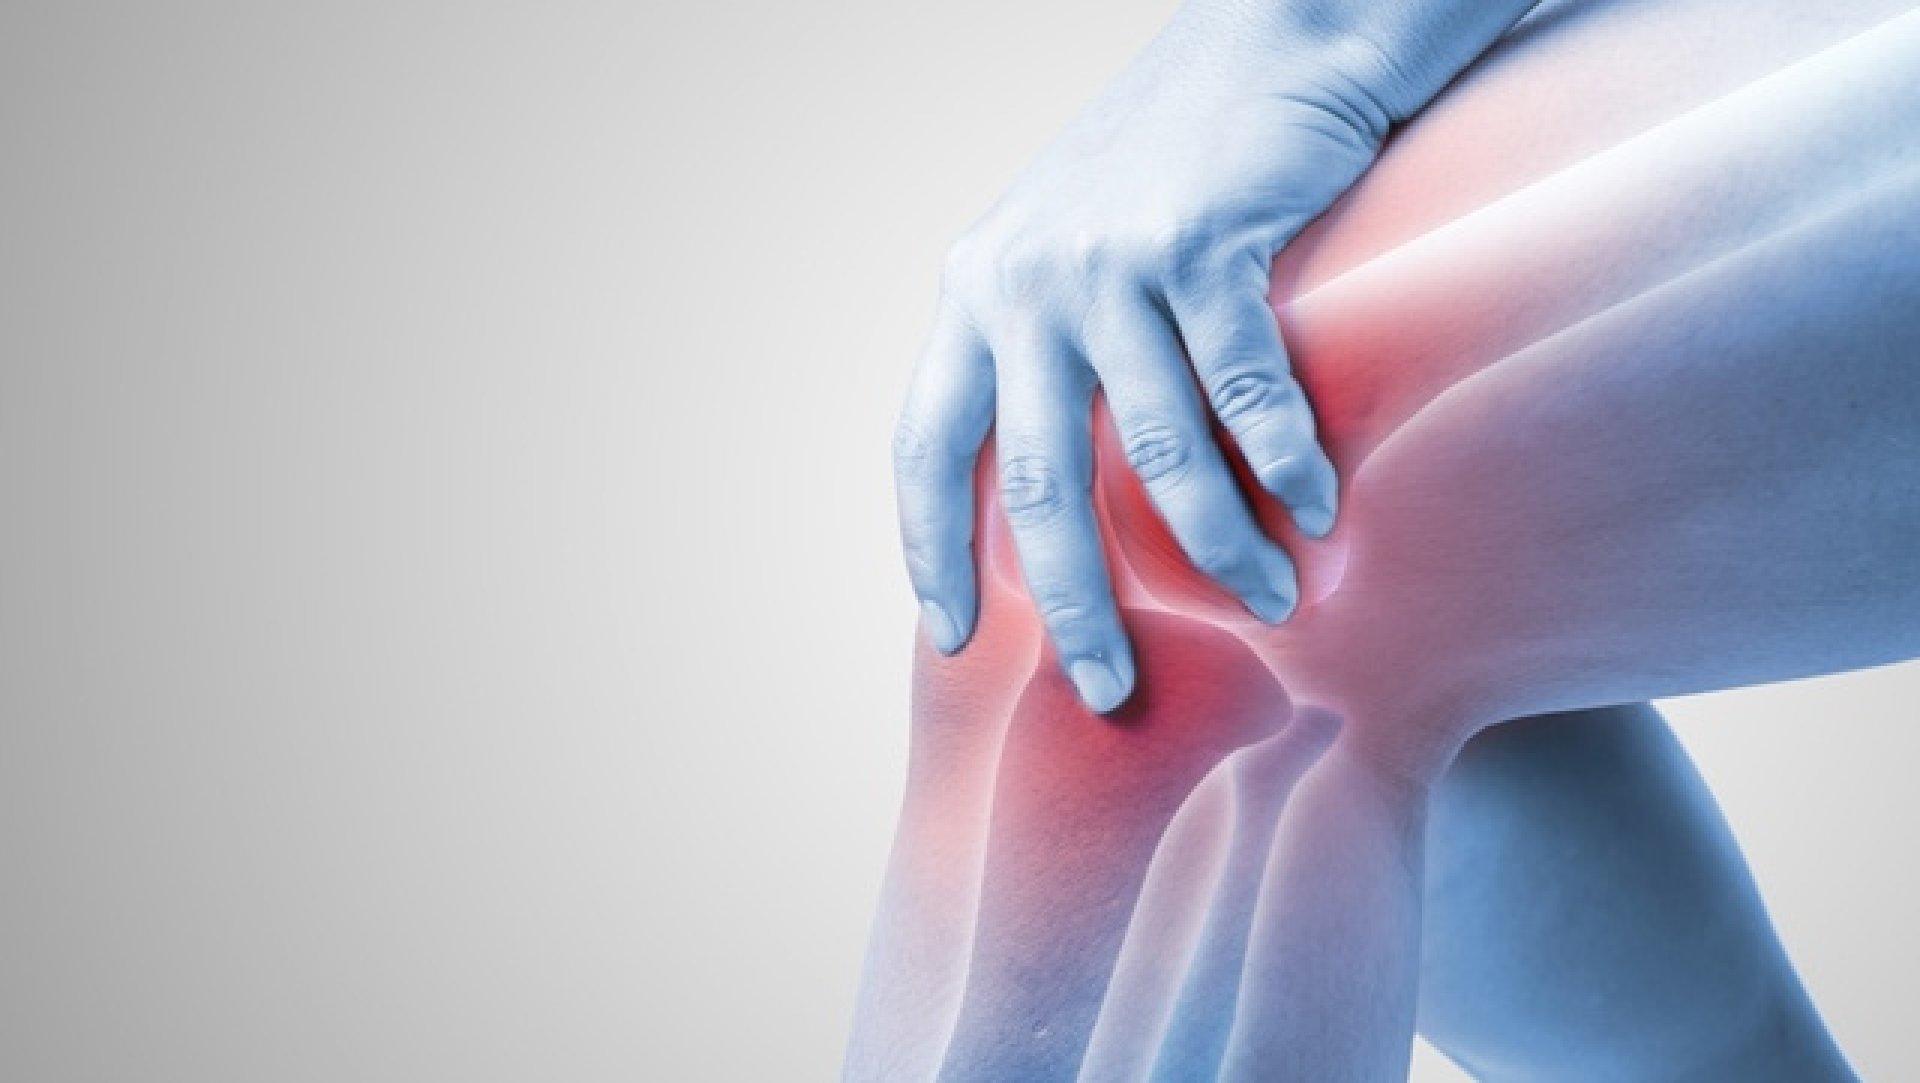 cum să tratezi articulația încheieturii